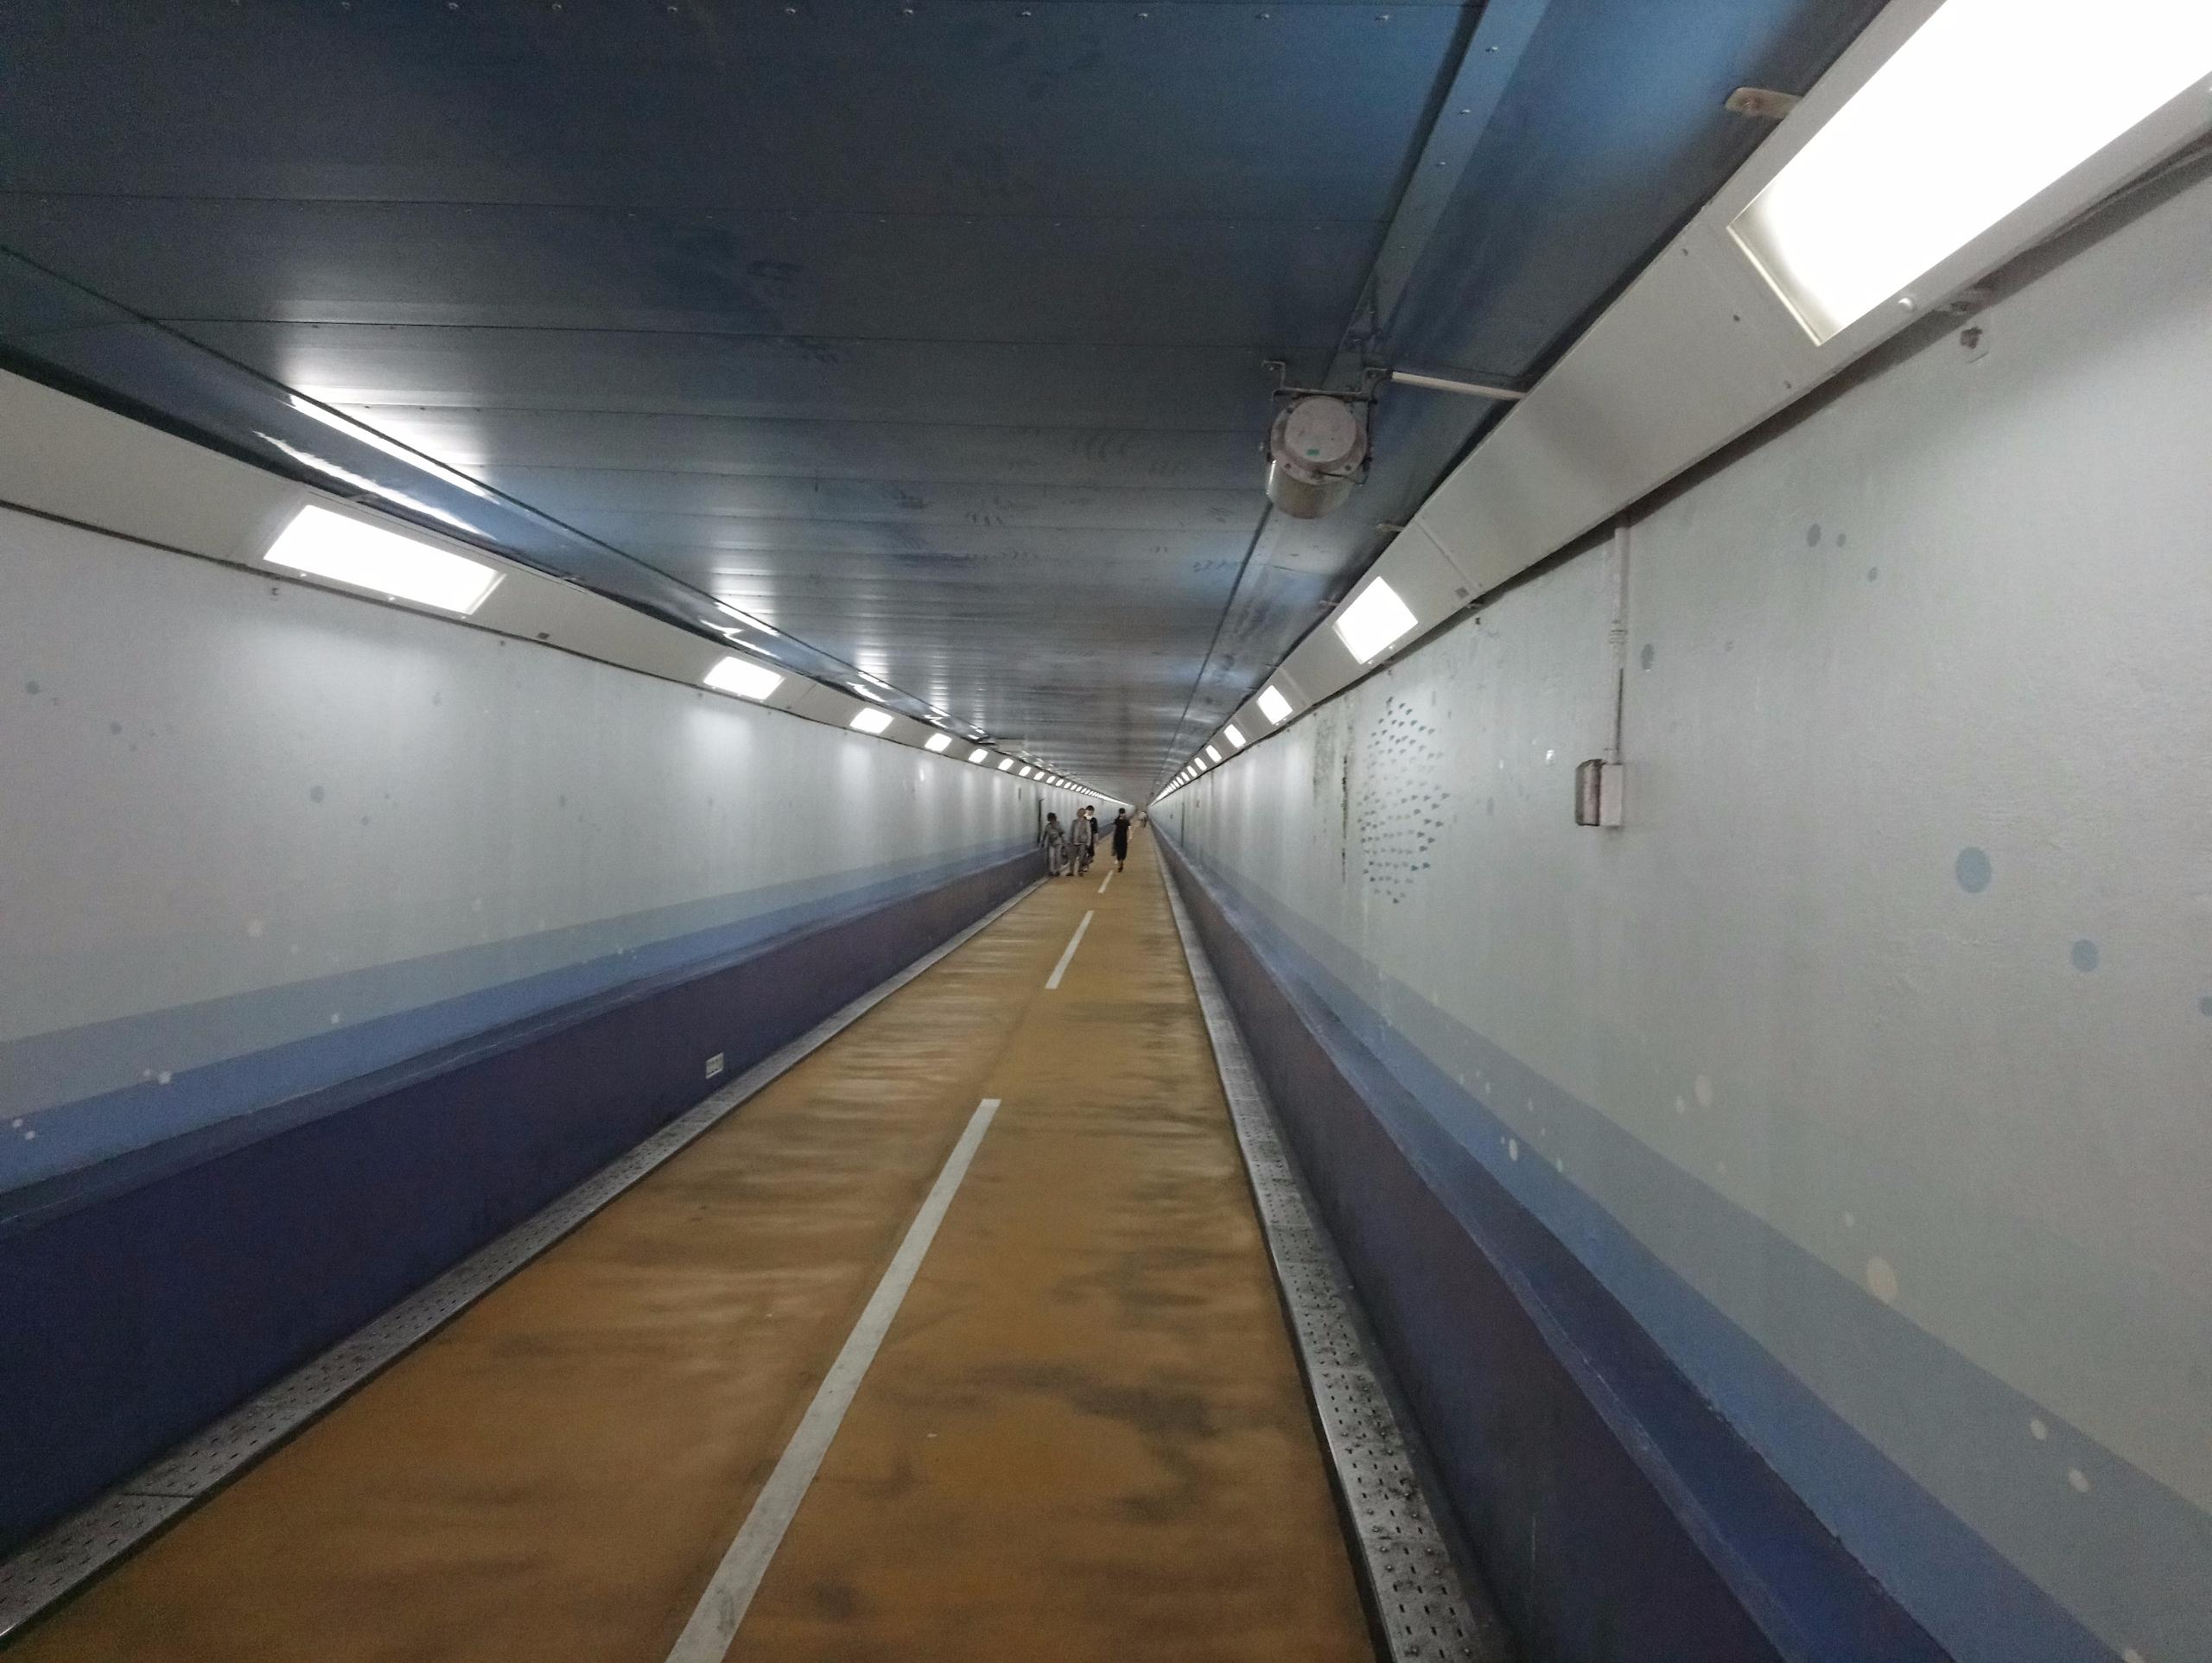 Kanmon-tunnel Shimonoseki, Japa - hamchang | ello